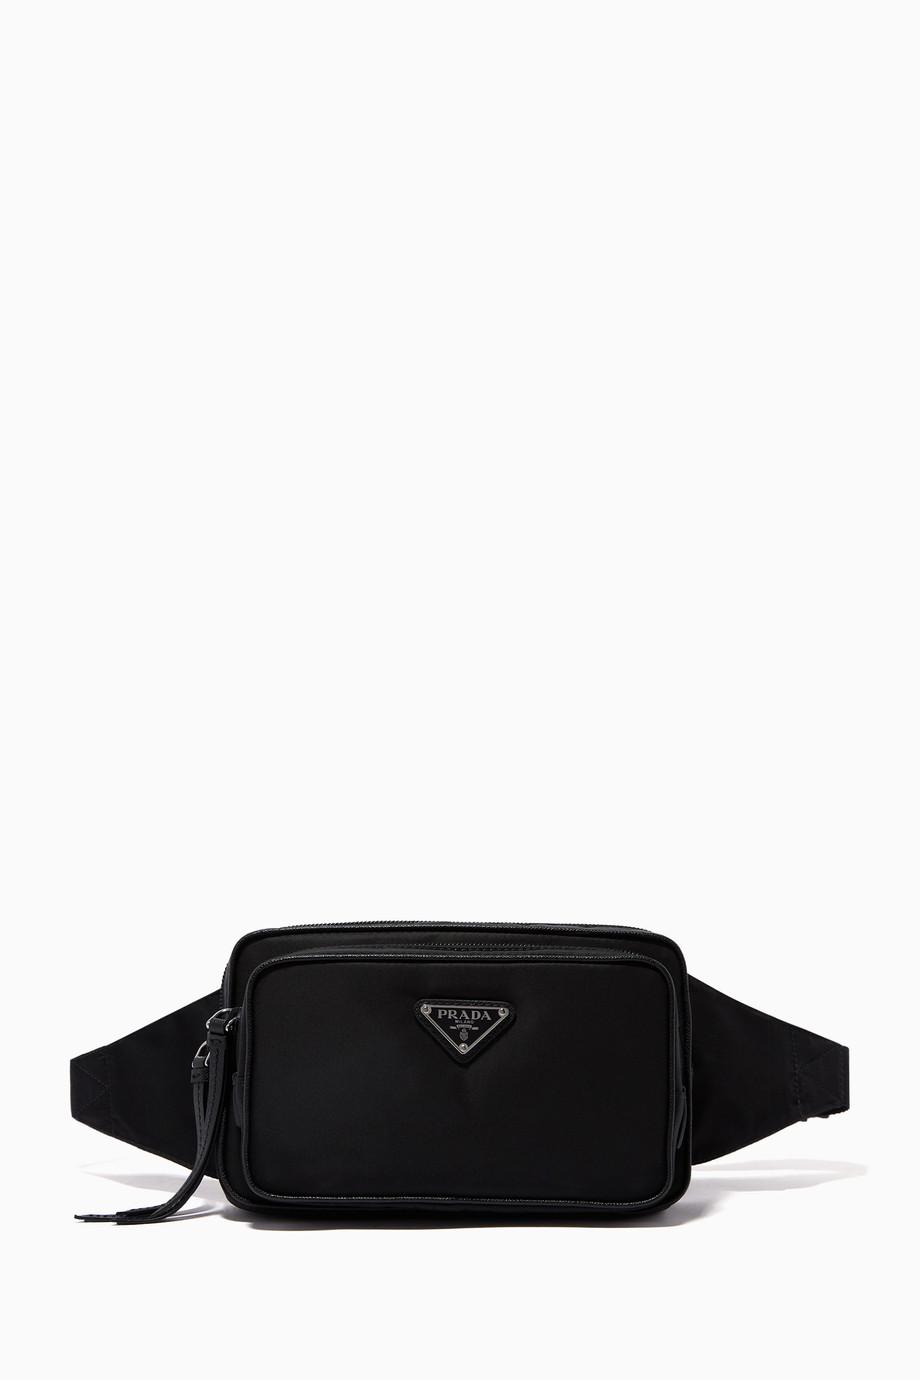 02d254212b095 Shop Prada Black Triangle Logo Nylon & Leather Belt Bag for Women ...